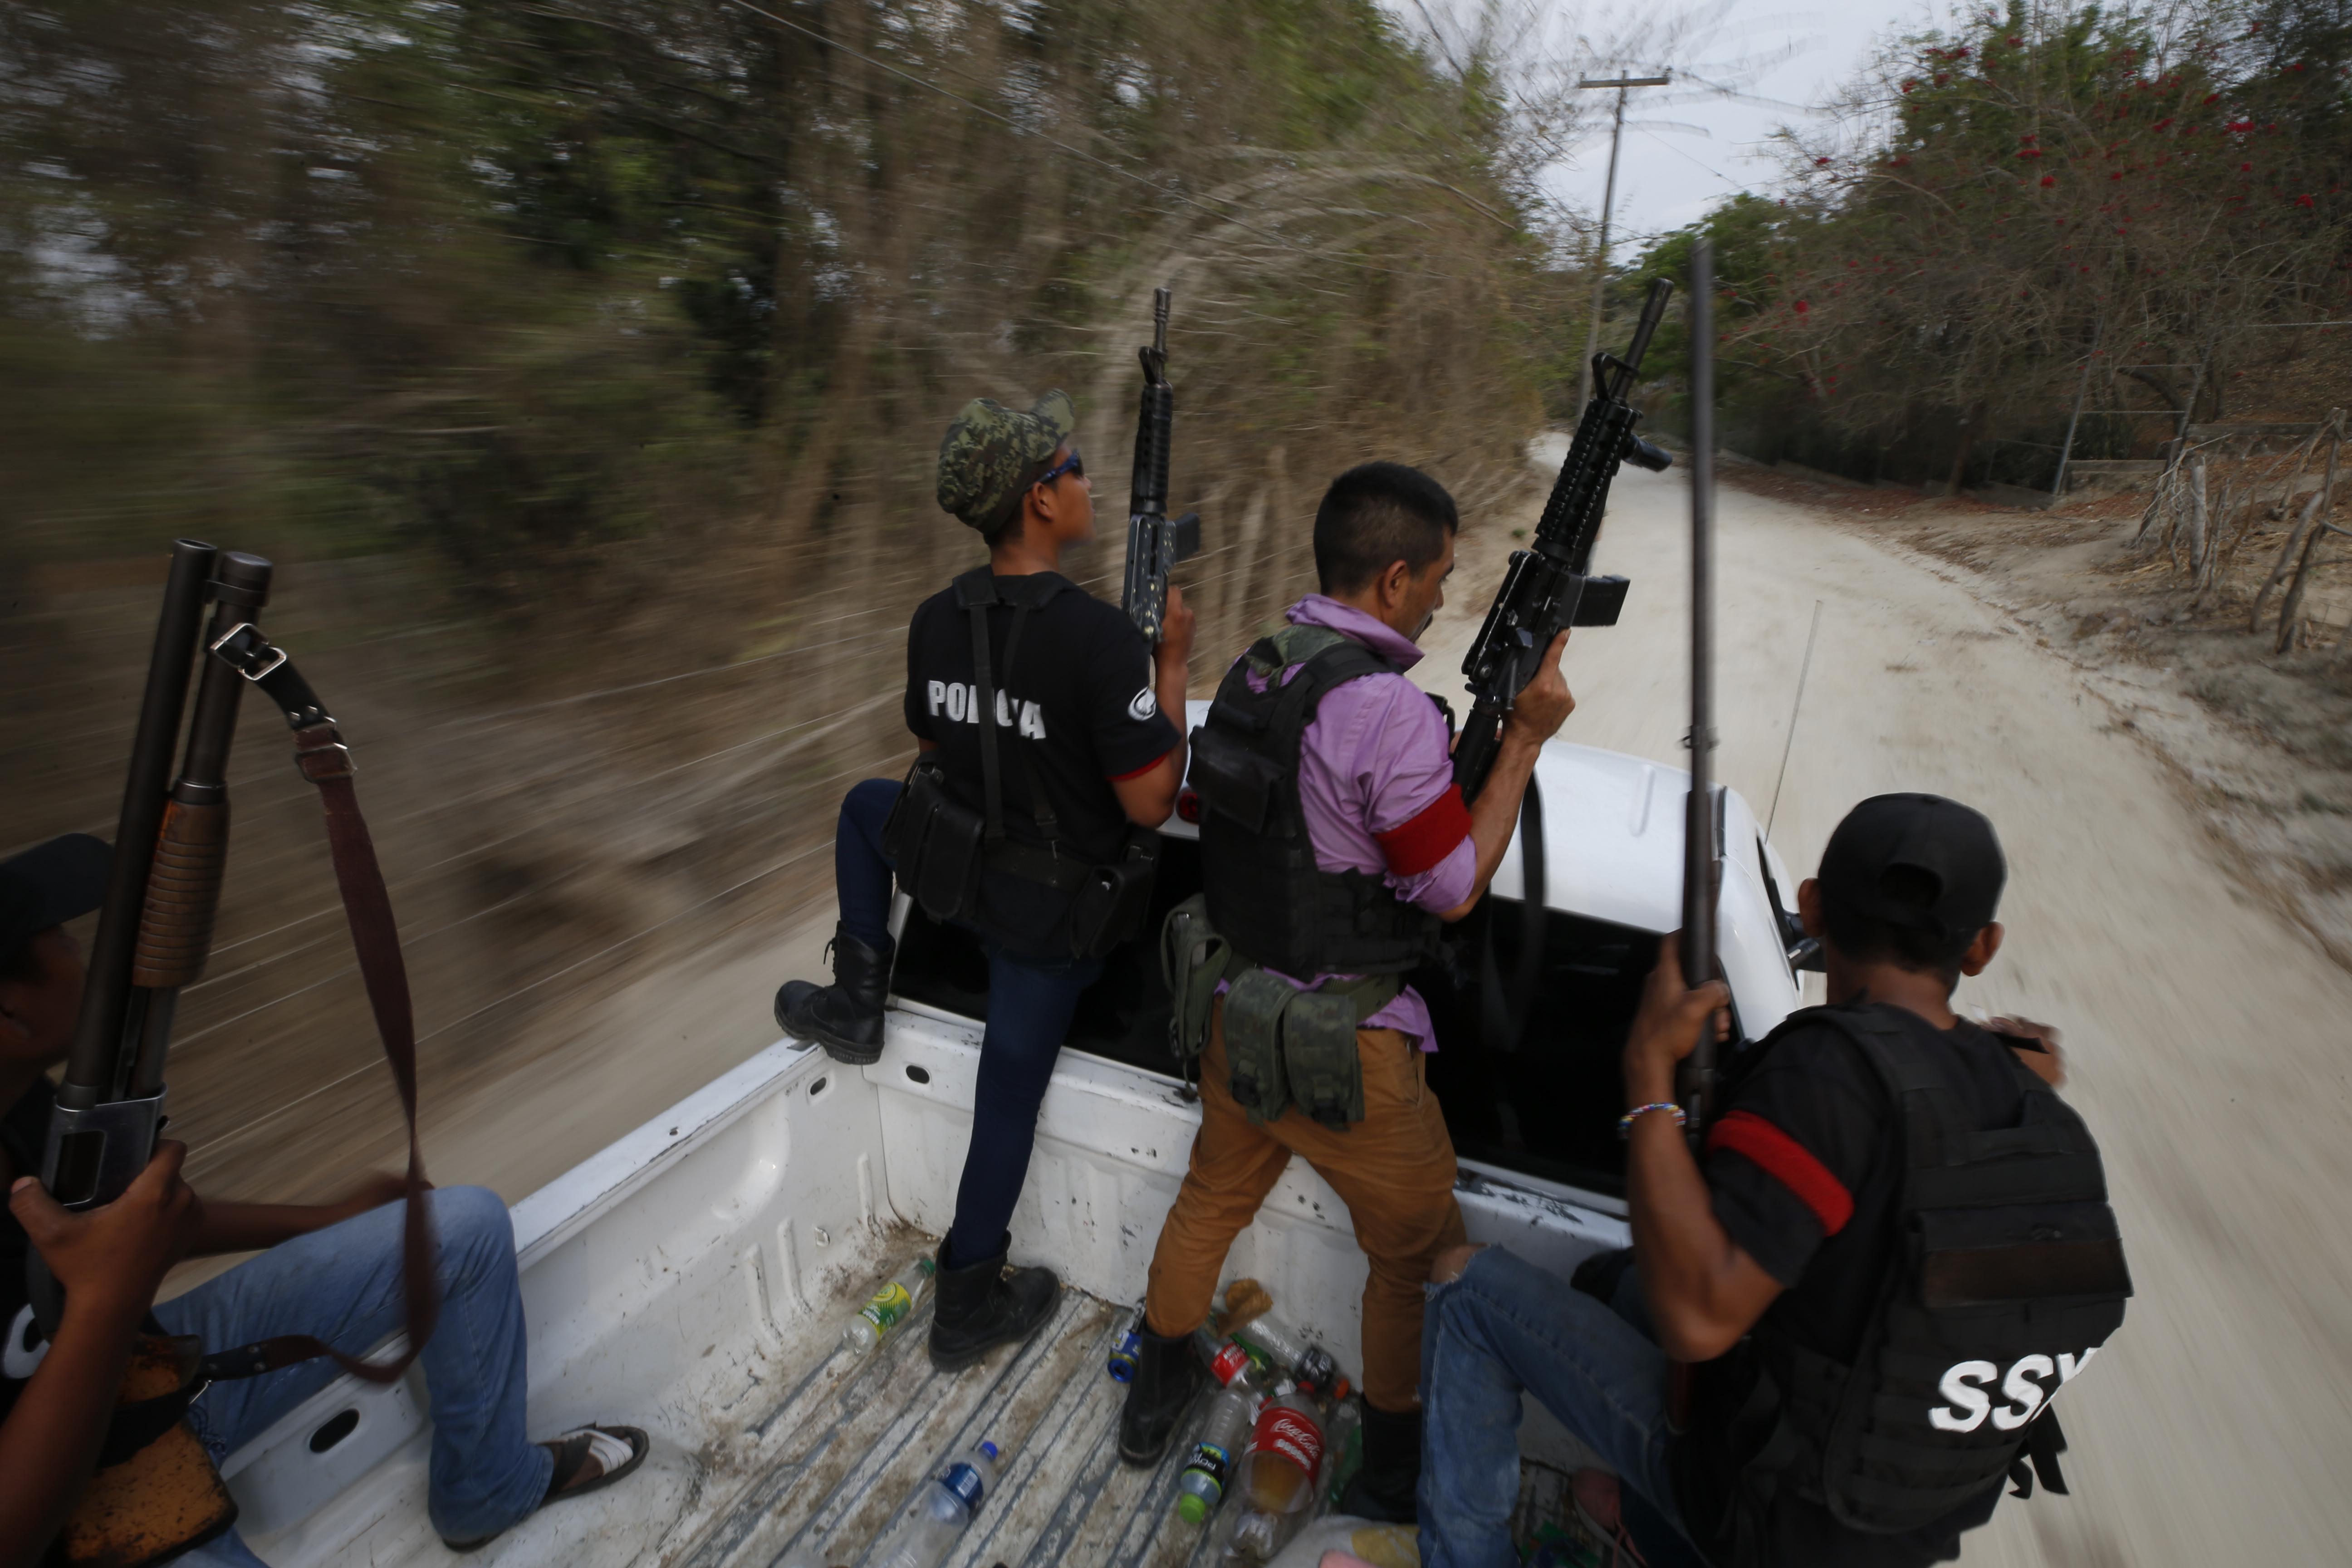 Mexico struggles: whether to talk to vigilantes or jail them